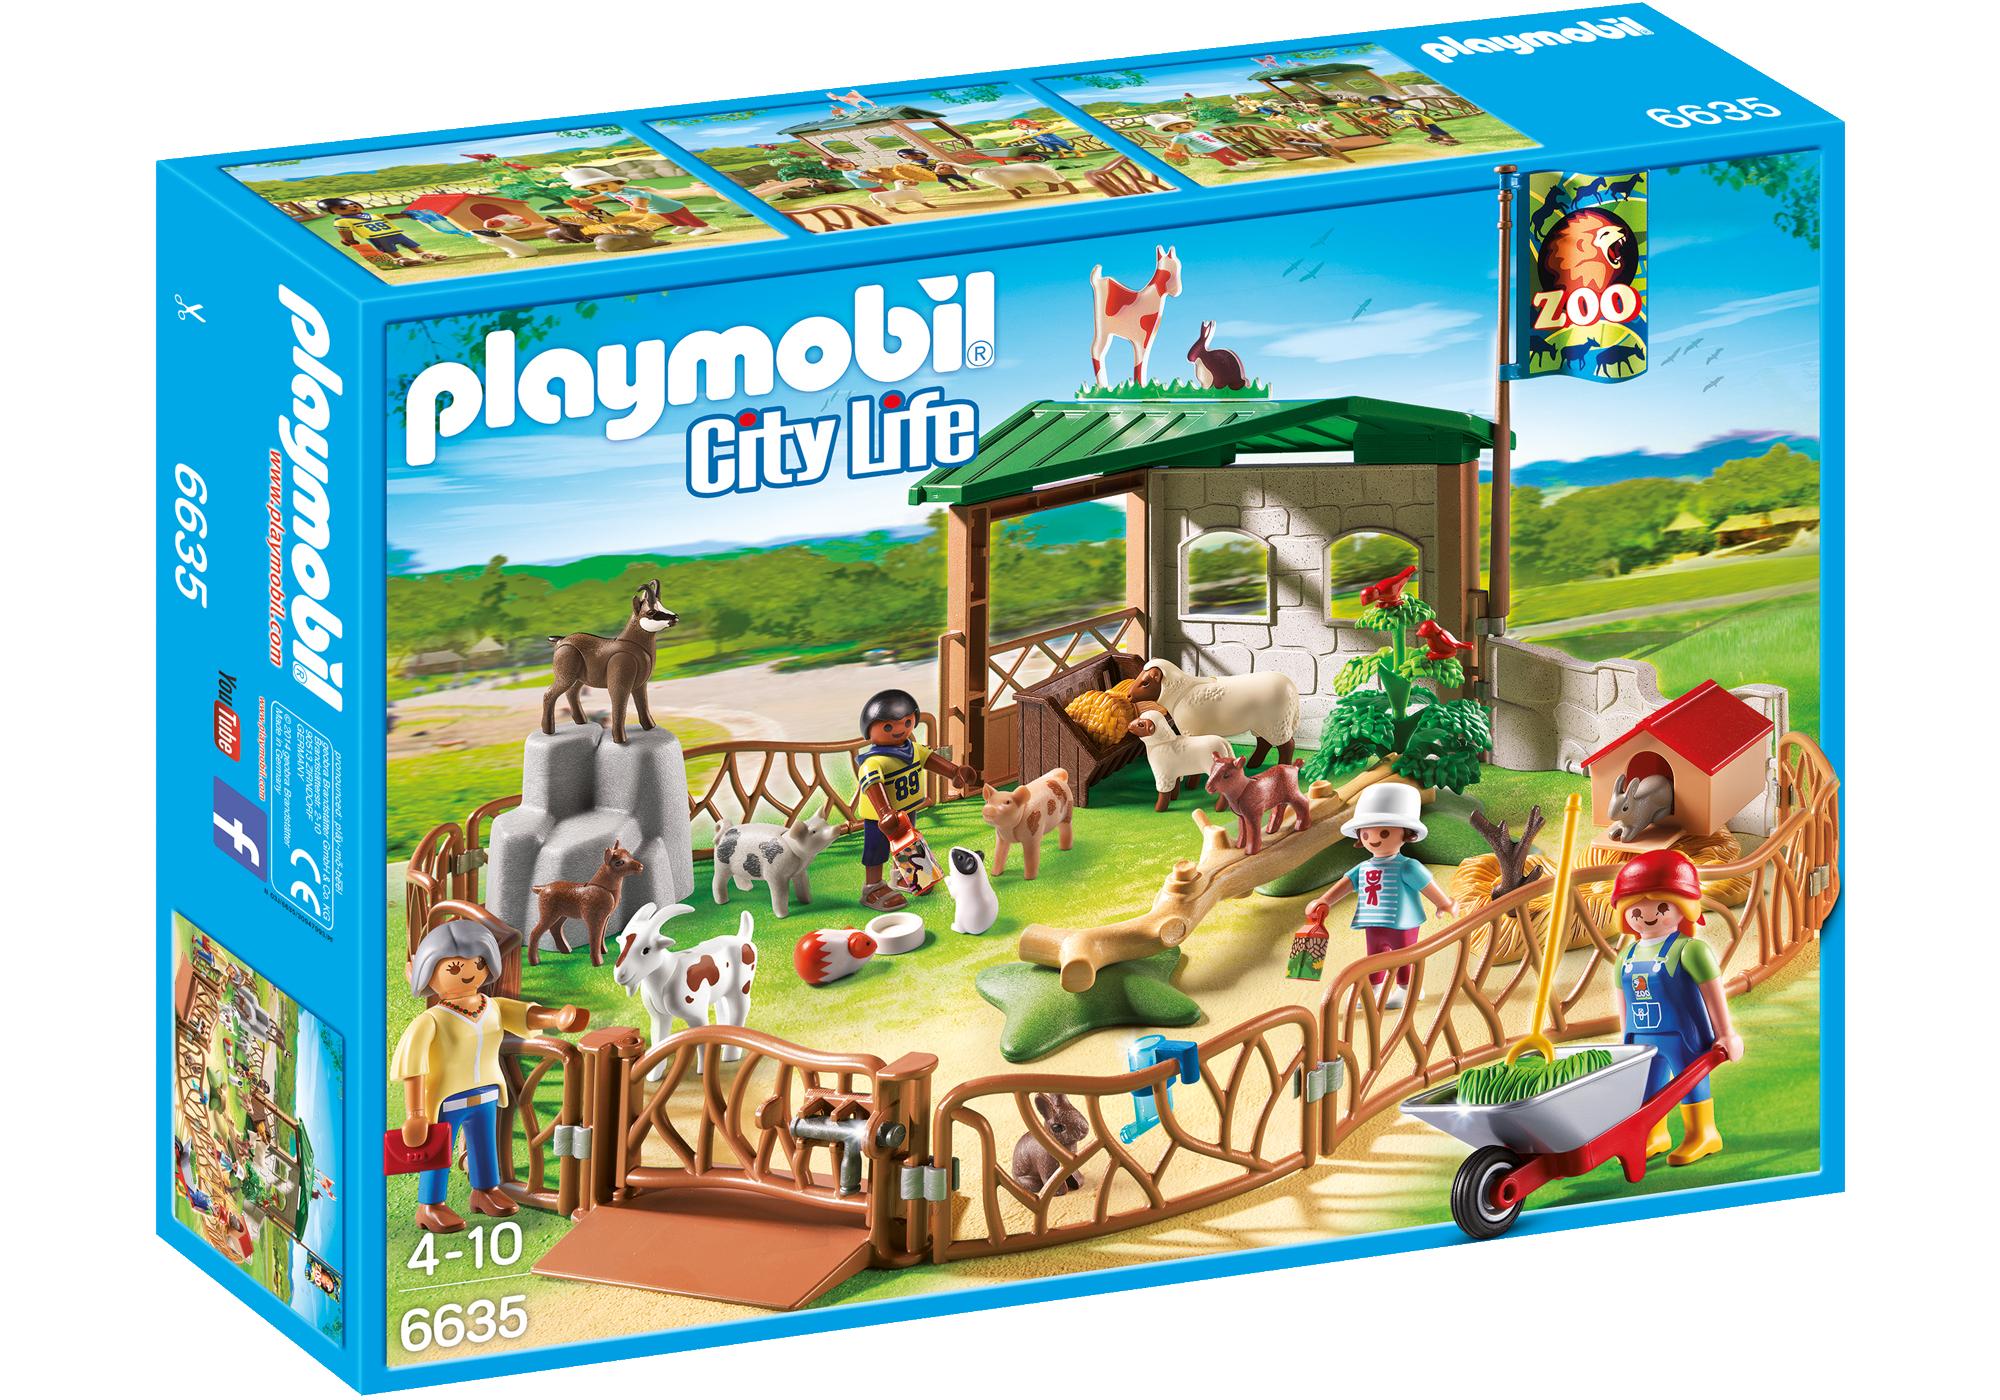 http://media.playmobil.com/i/playmobil/6635_product_box_front